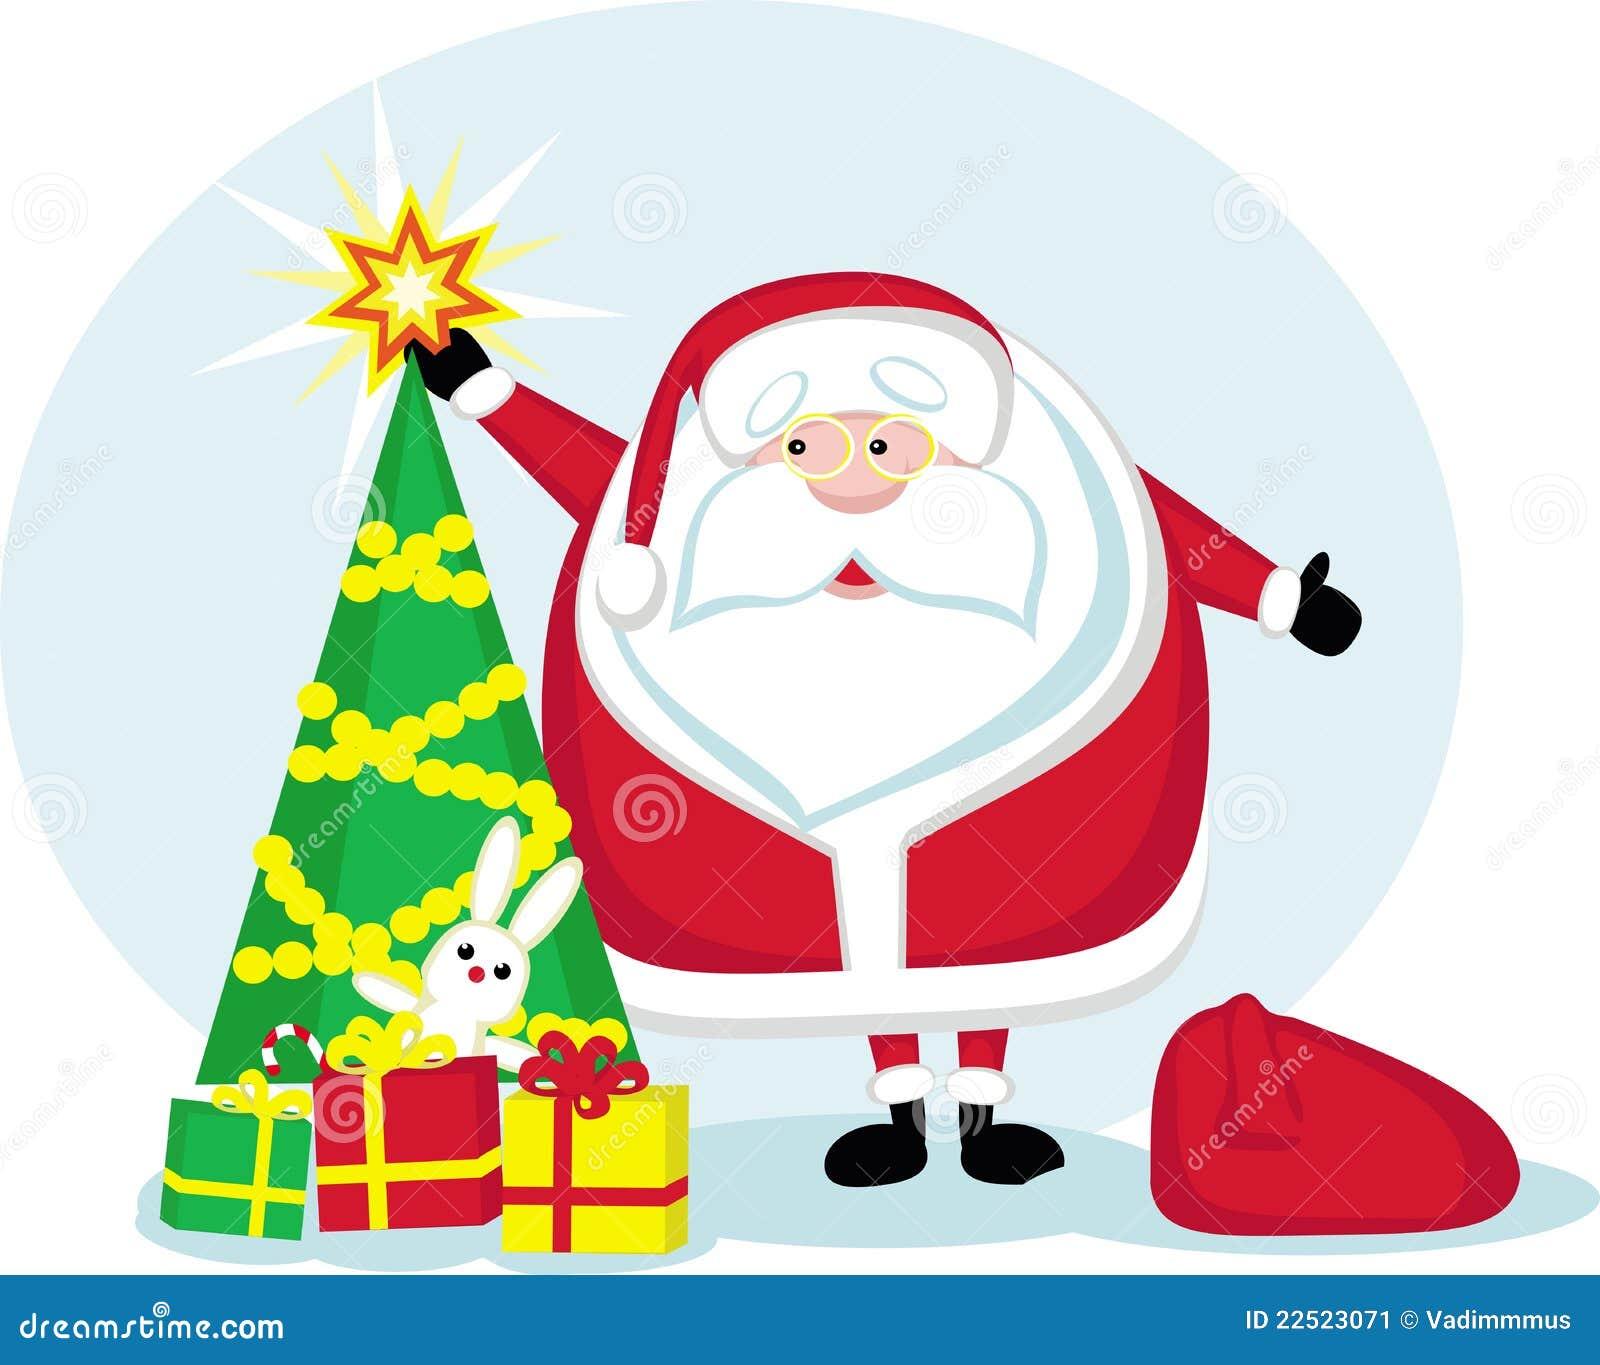 Christmas Toys Cartoon : Cartoon santa star christmas tree and gifts stock vector